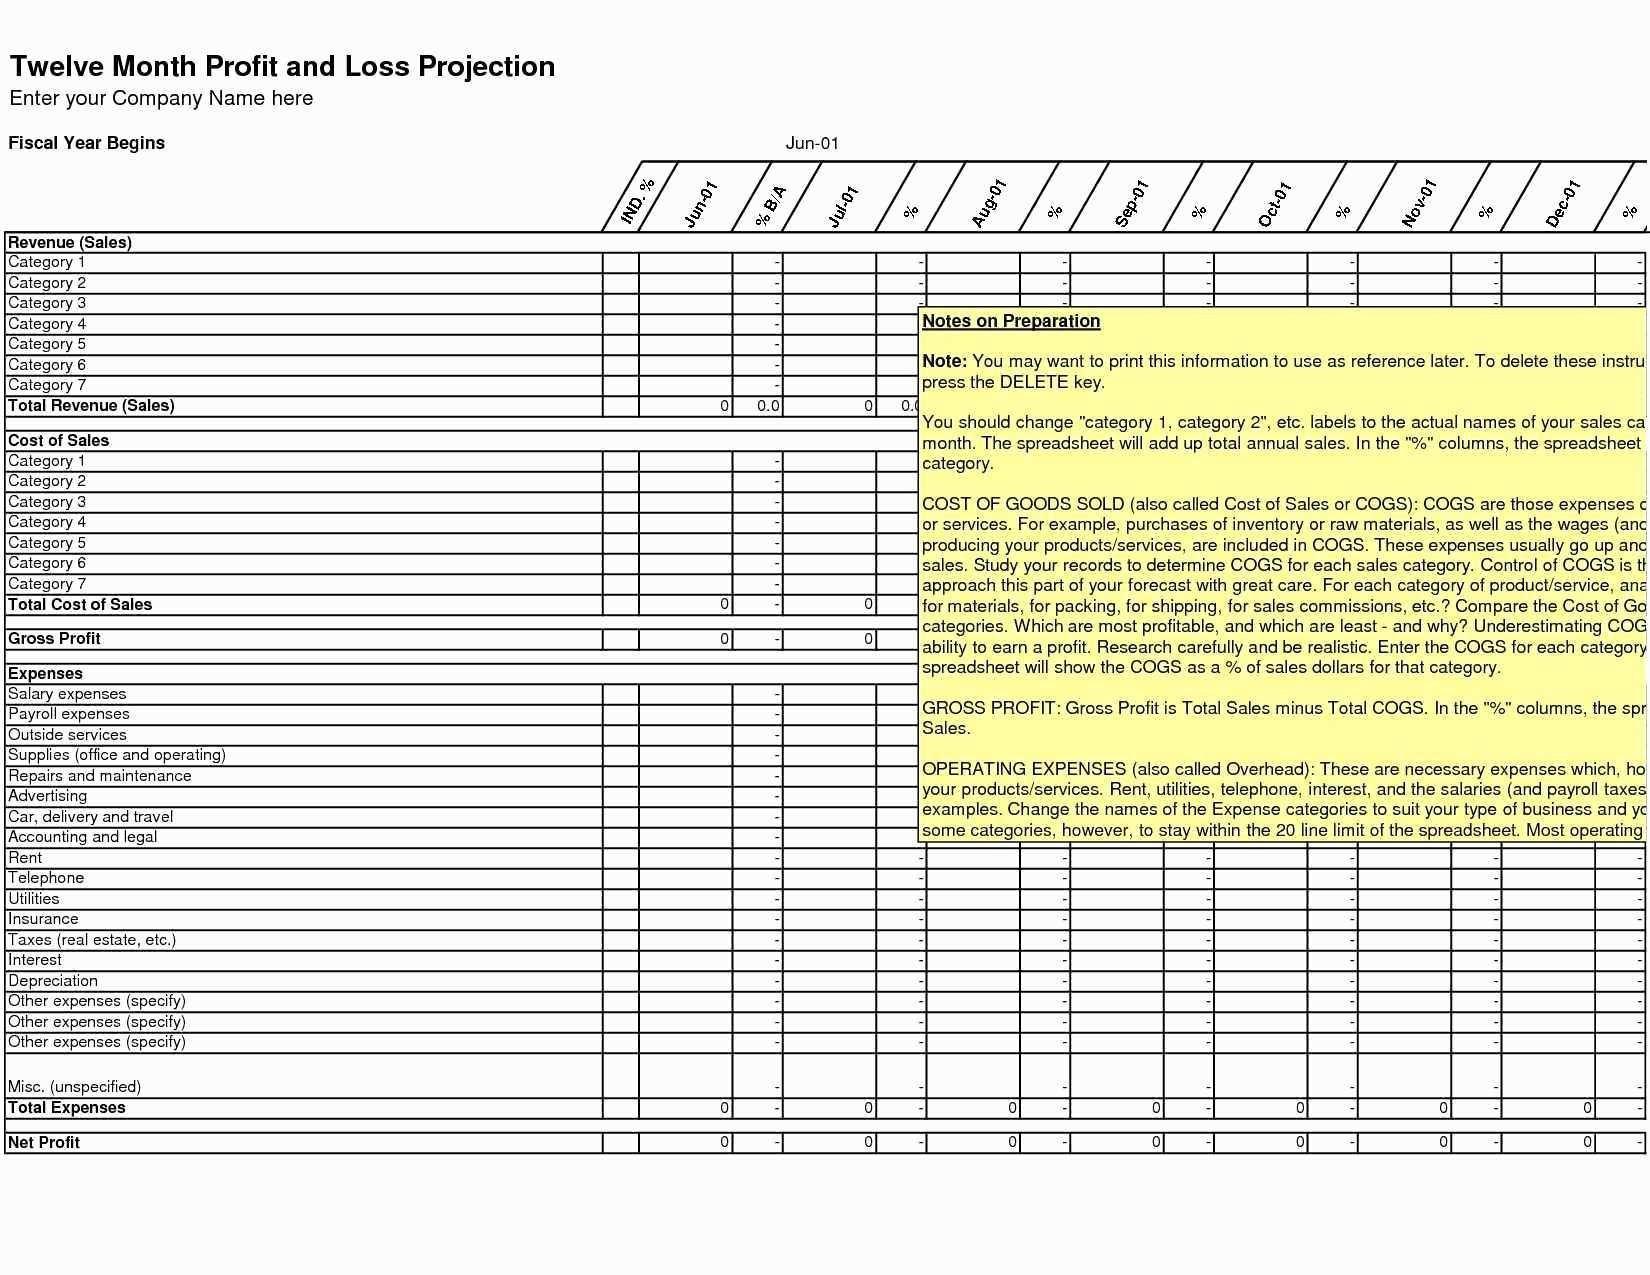 Avon Taxes Spreadsheet With Small Business Tax Spreadsheet